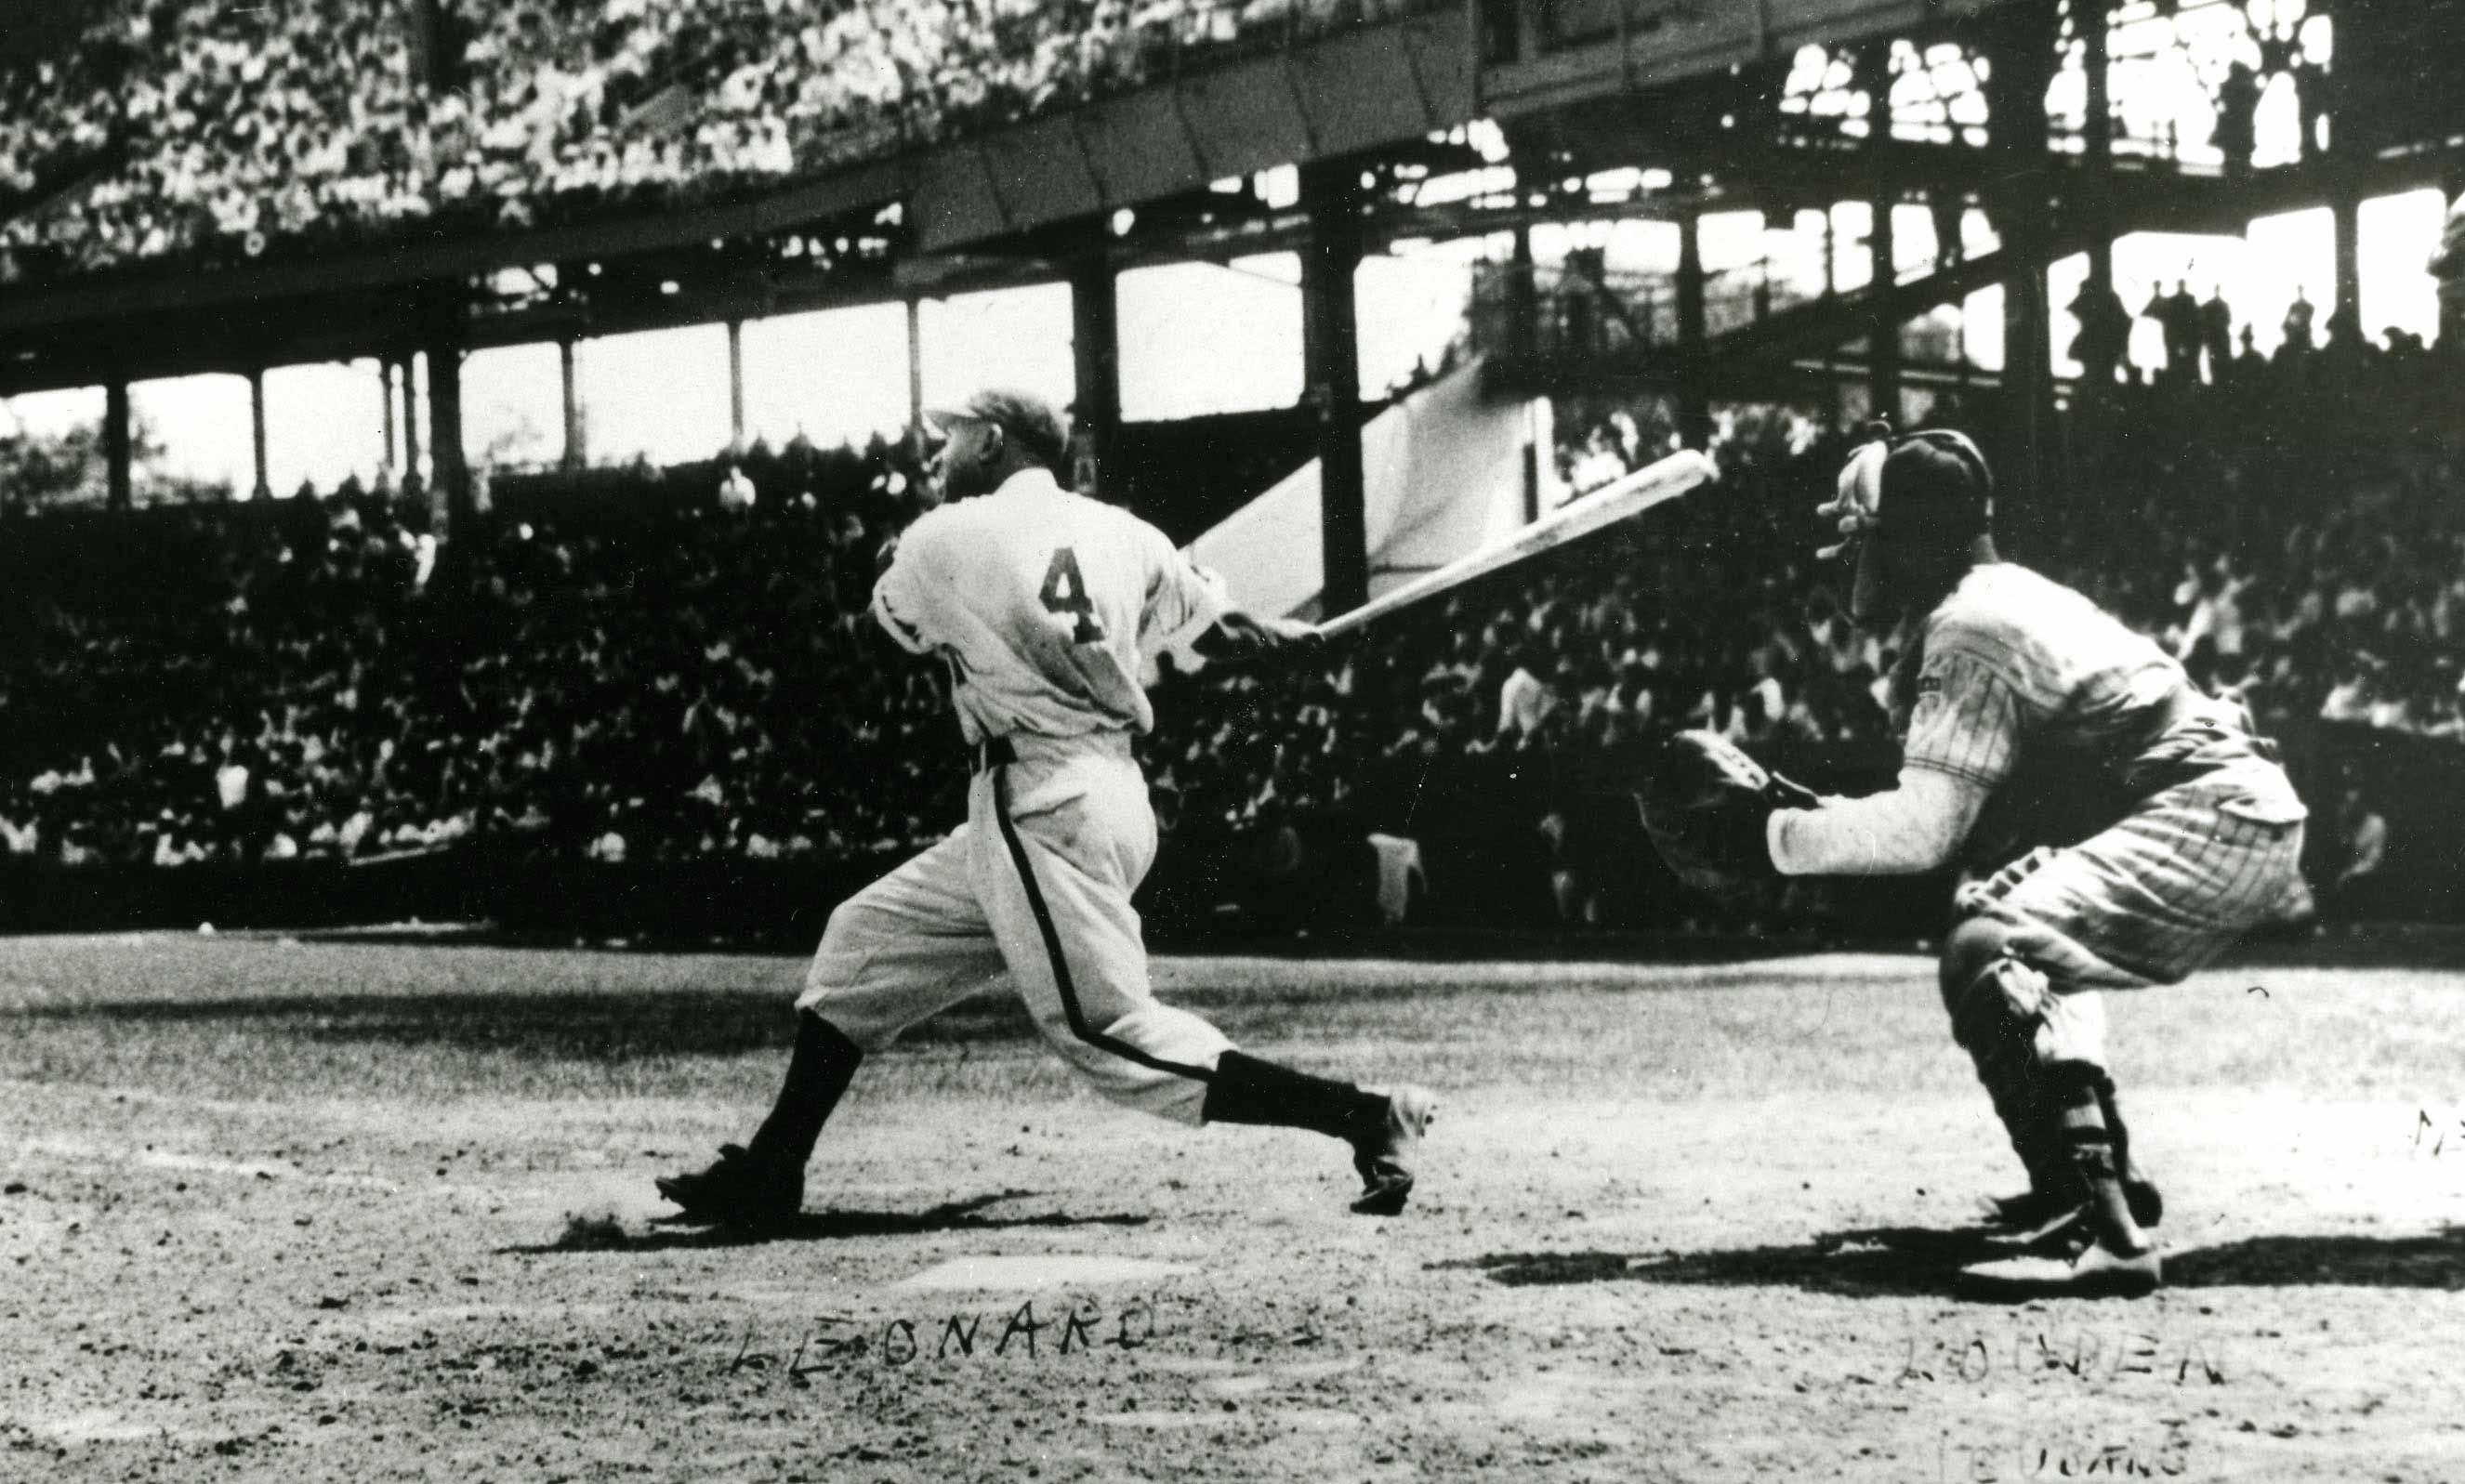 Walter Leonard batting